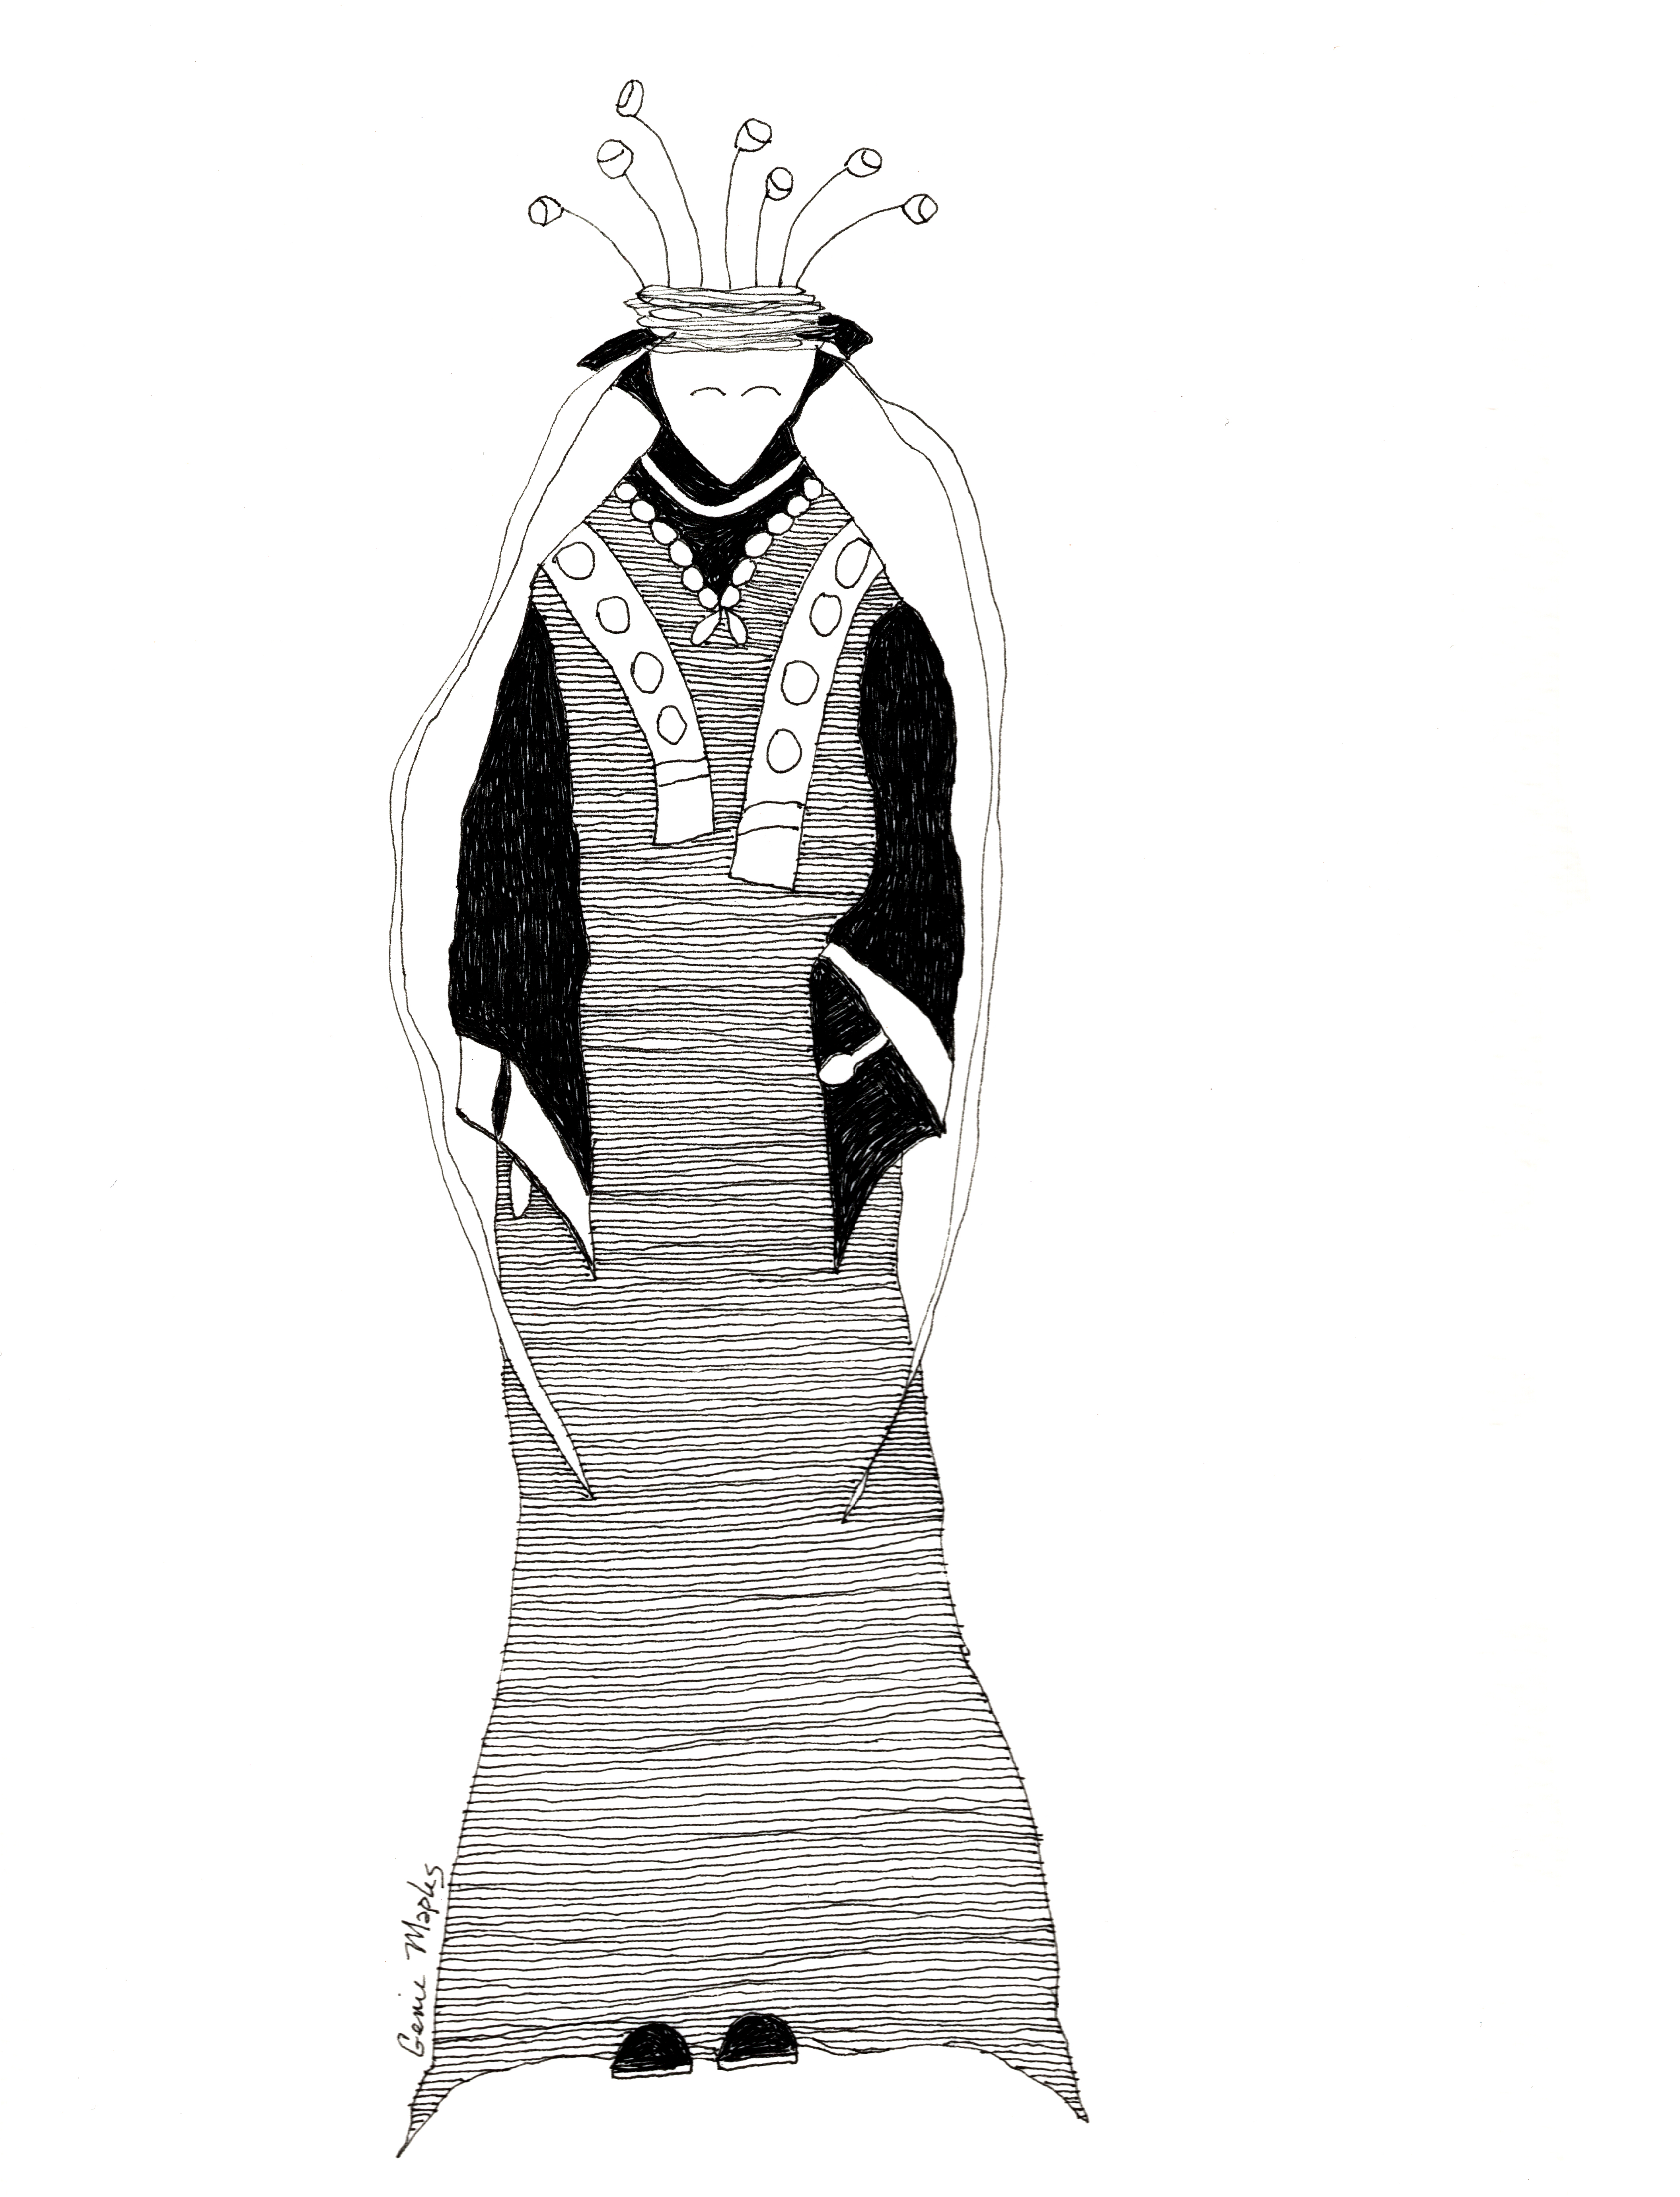 Piety's New Dress